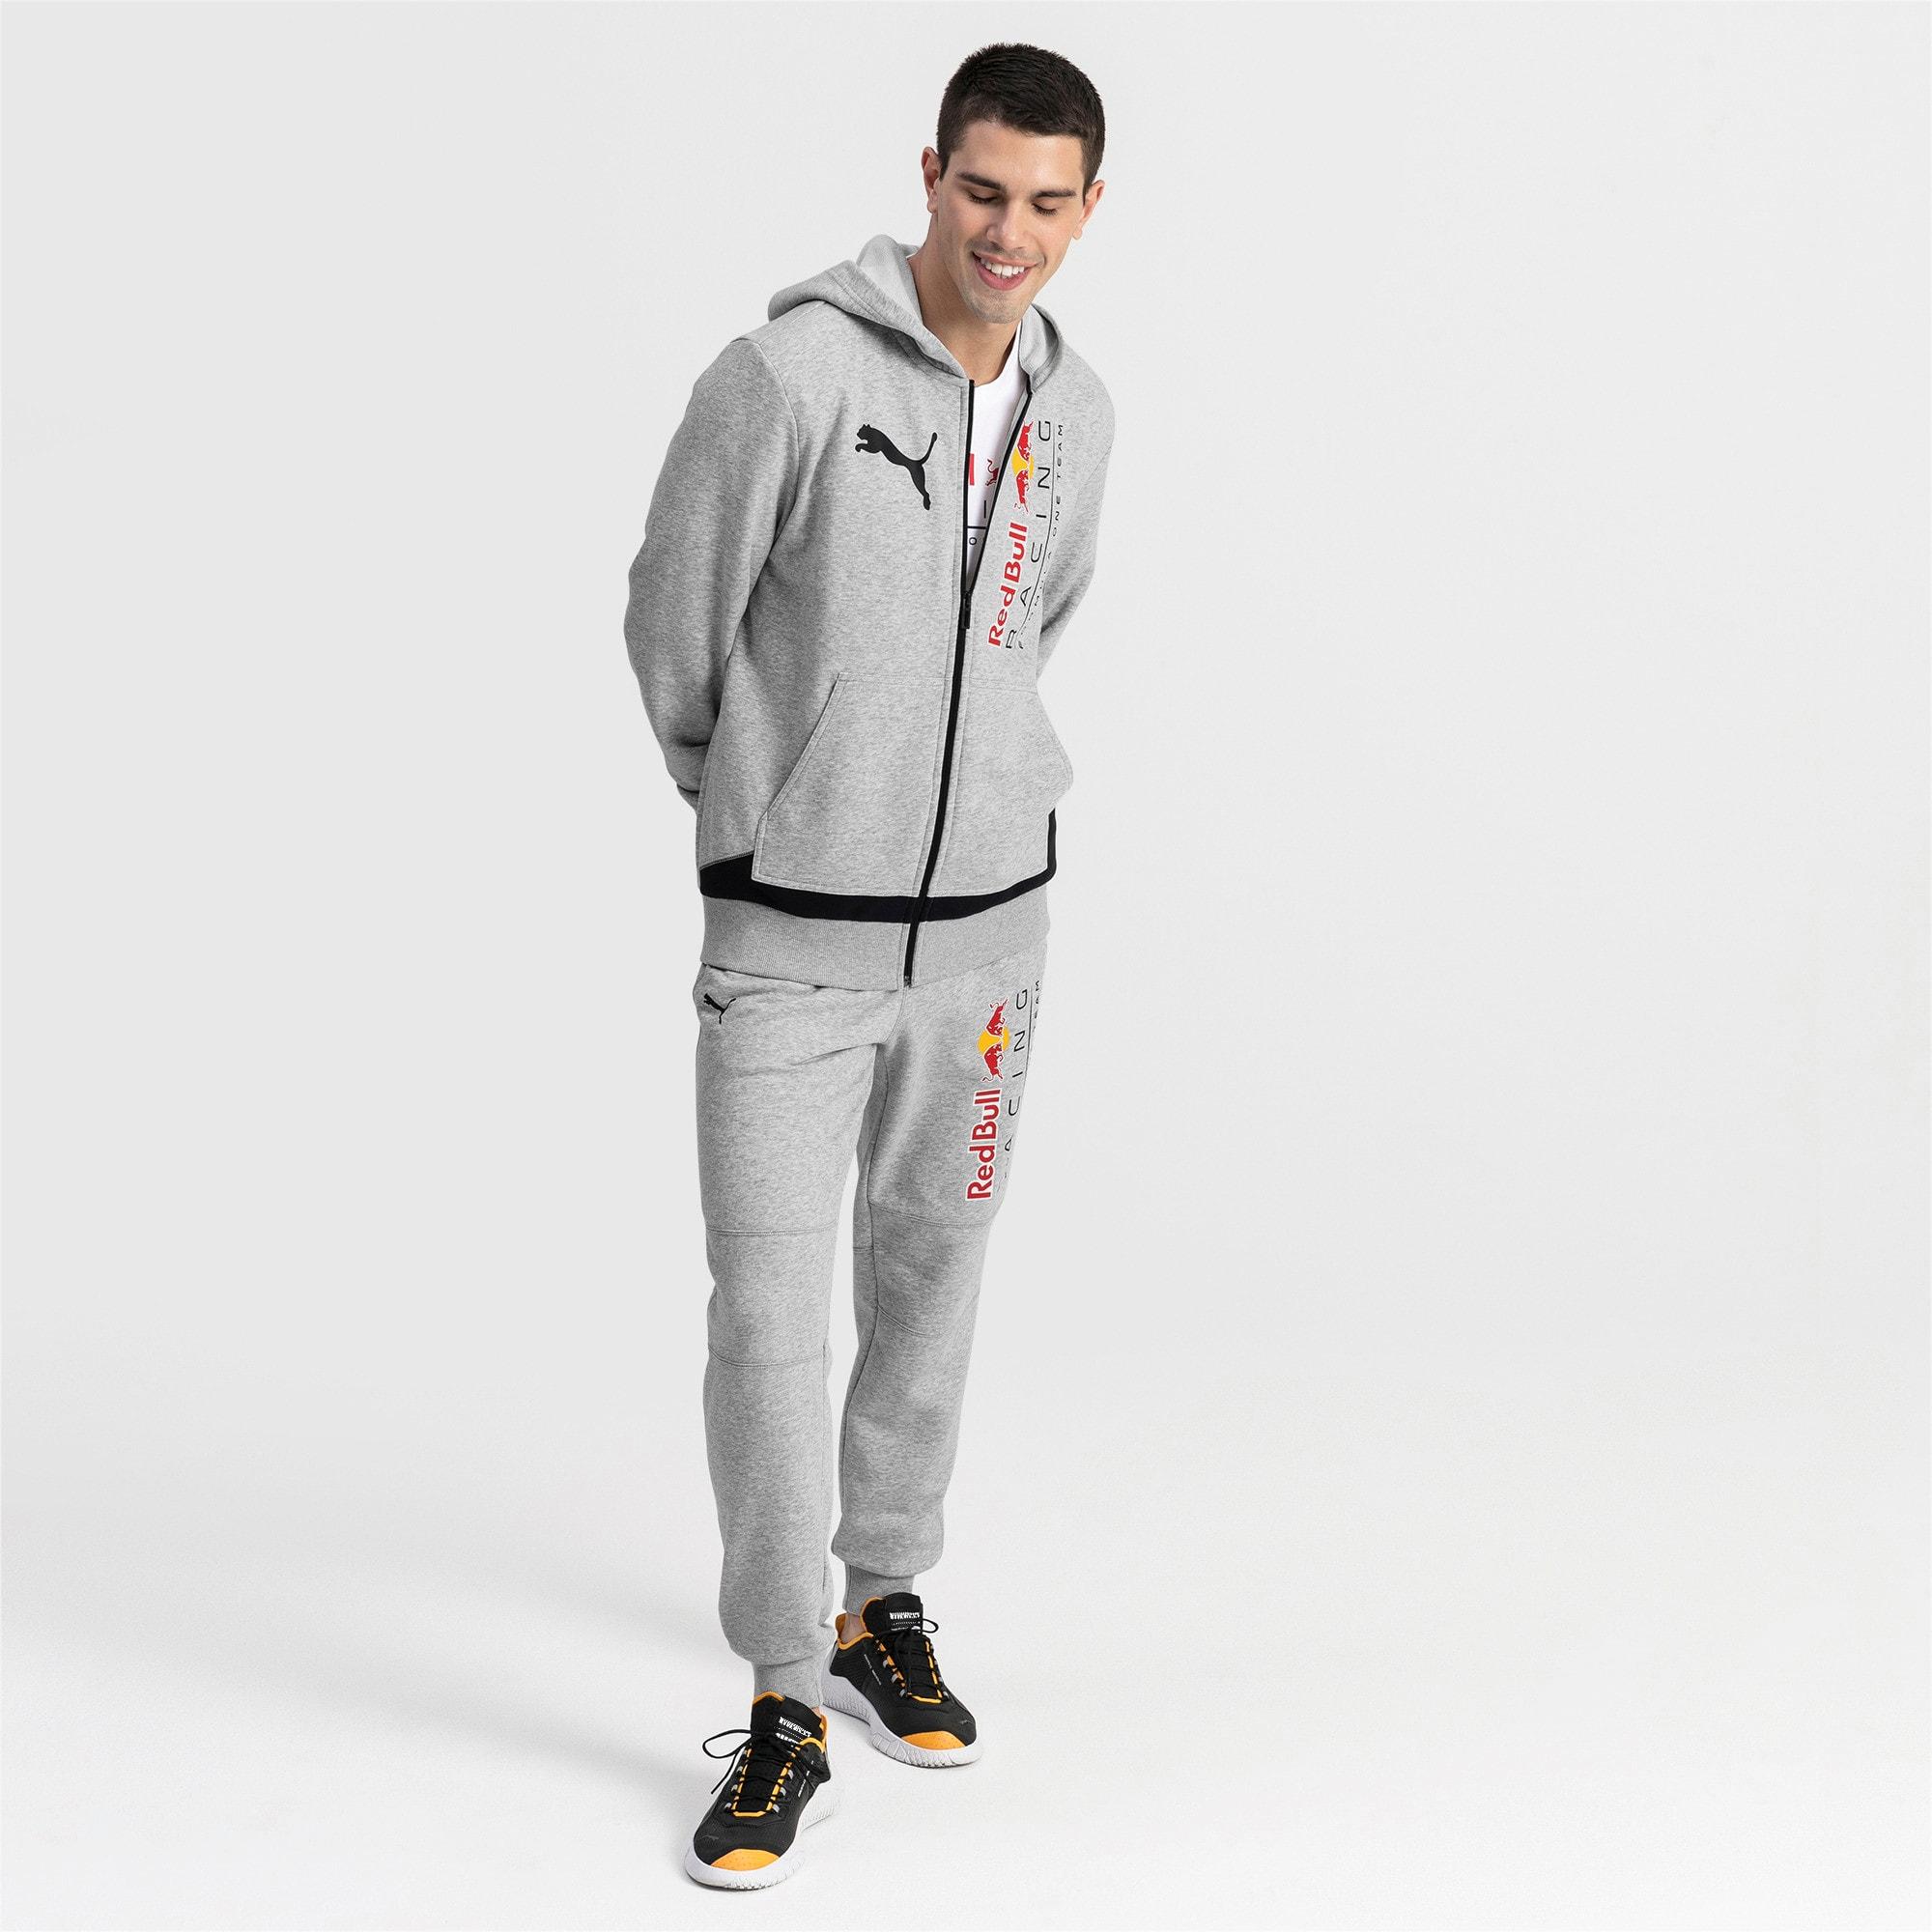 Thumbnail 3 of RBR Logo Hooded Men's Sweat Jacket, Light Gray Heather, medium